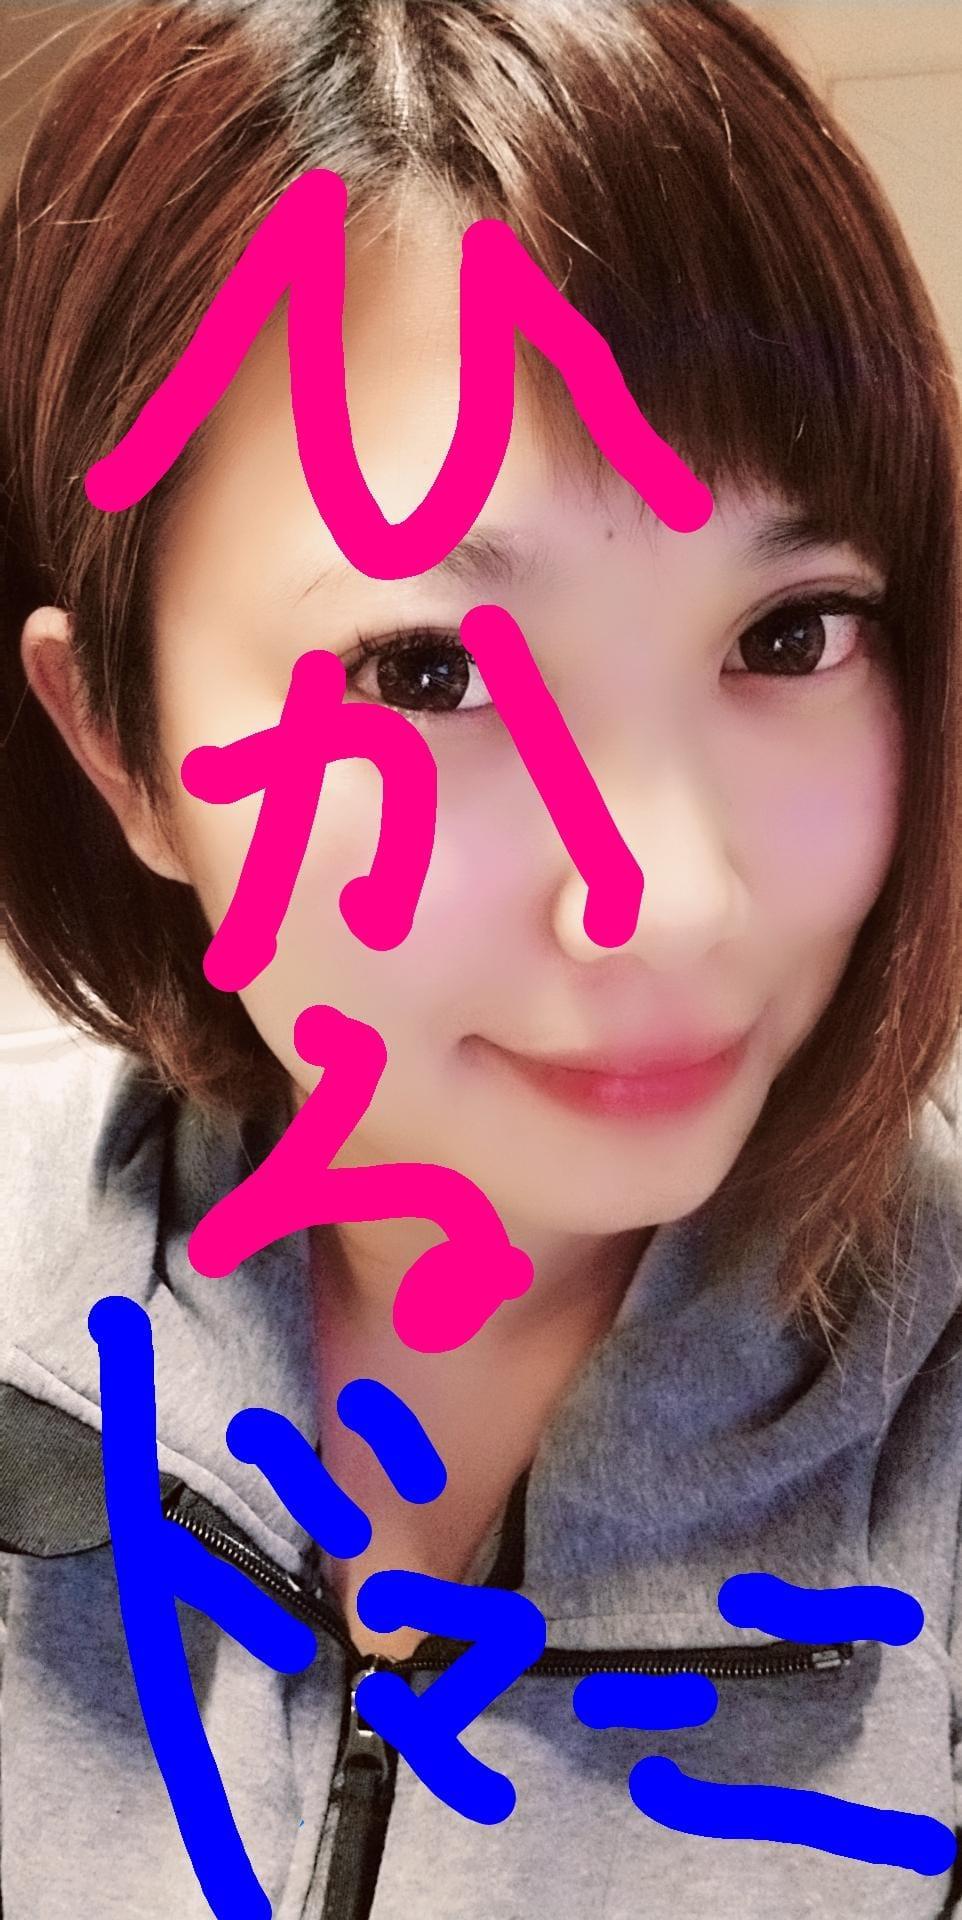 「hikaru」01/24(木) 08:46 | ひかるの写メ・風俗動画